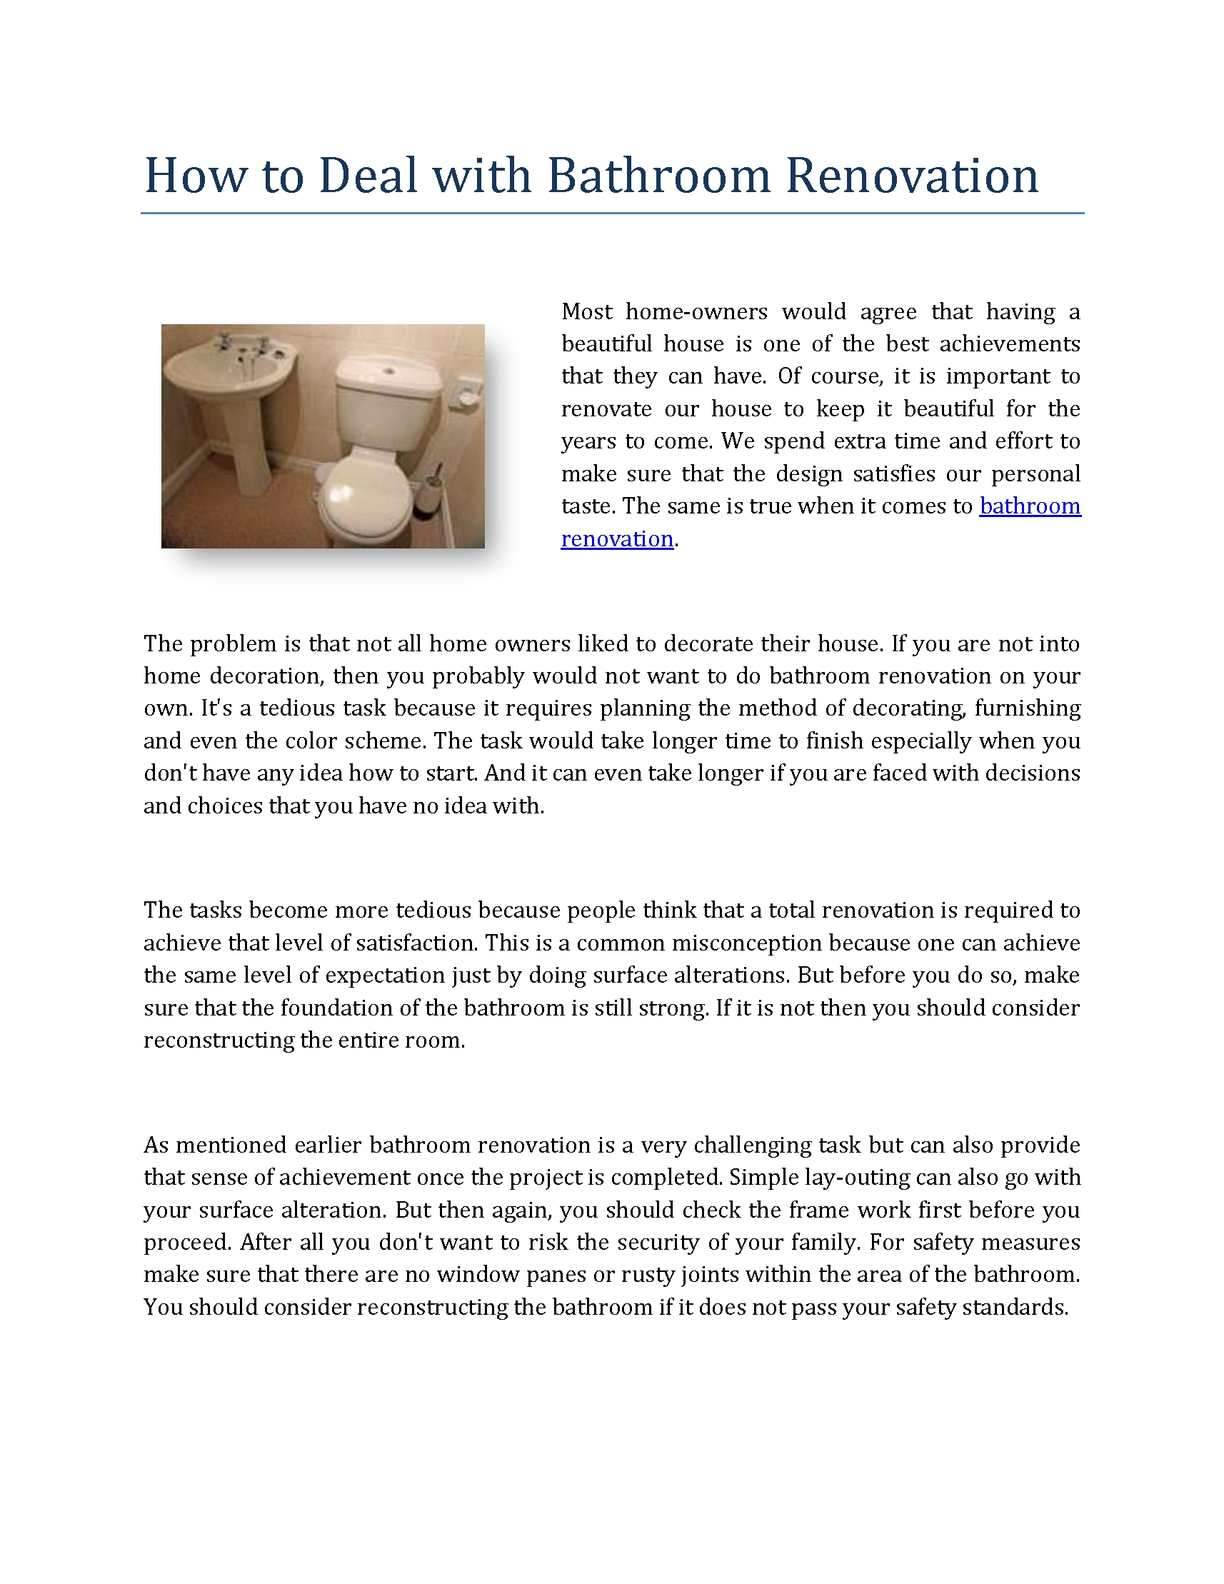 How To Deal With Bathroom Renovation, Bathroom Remodel Order Of Tasks